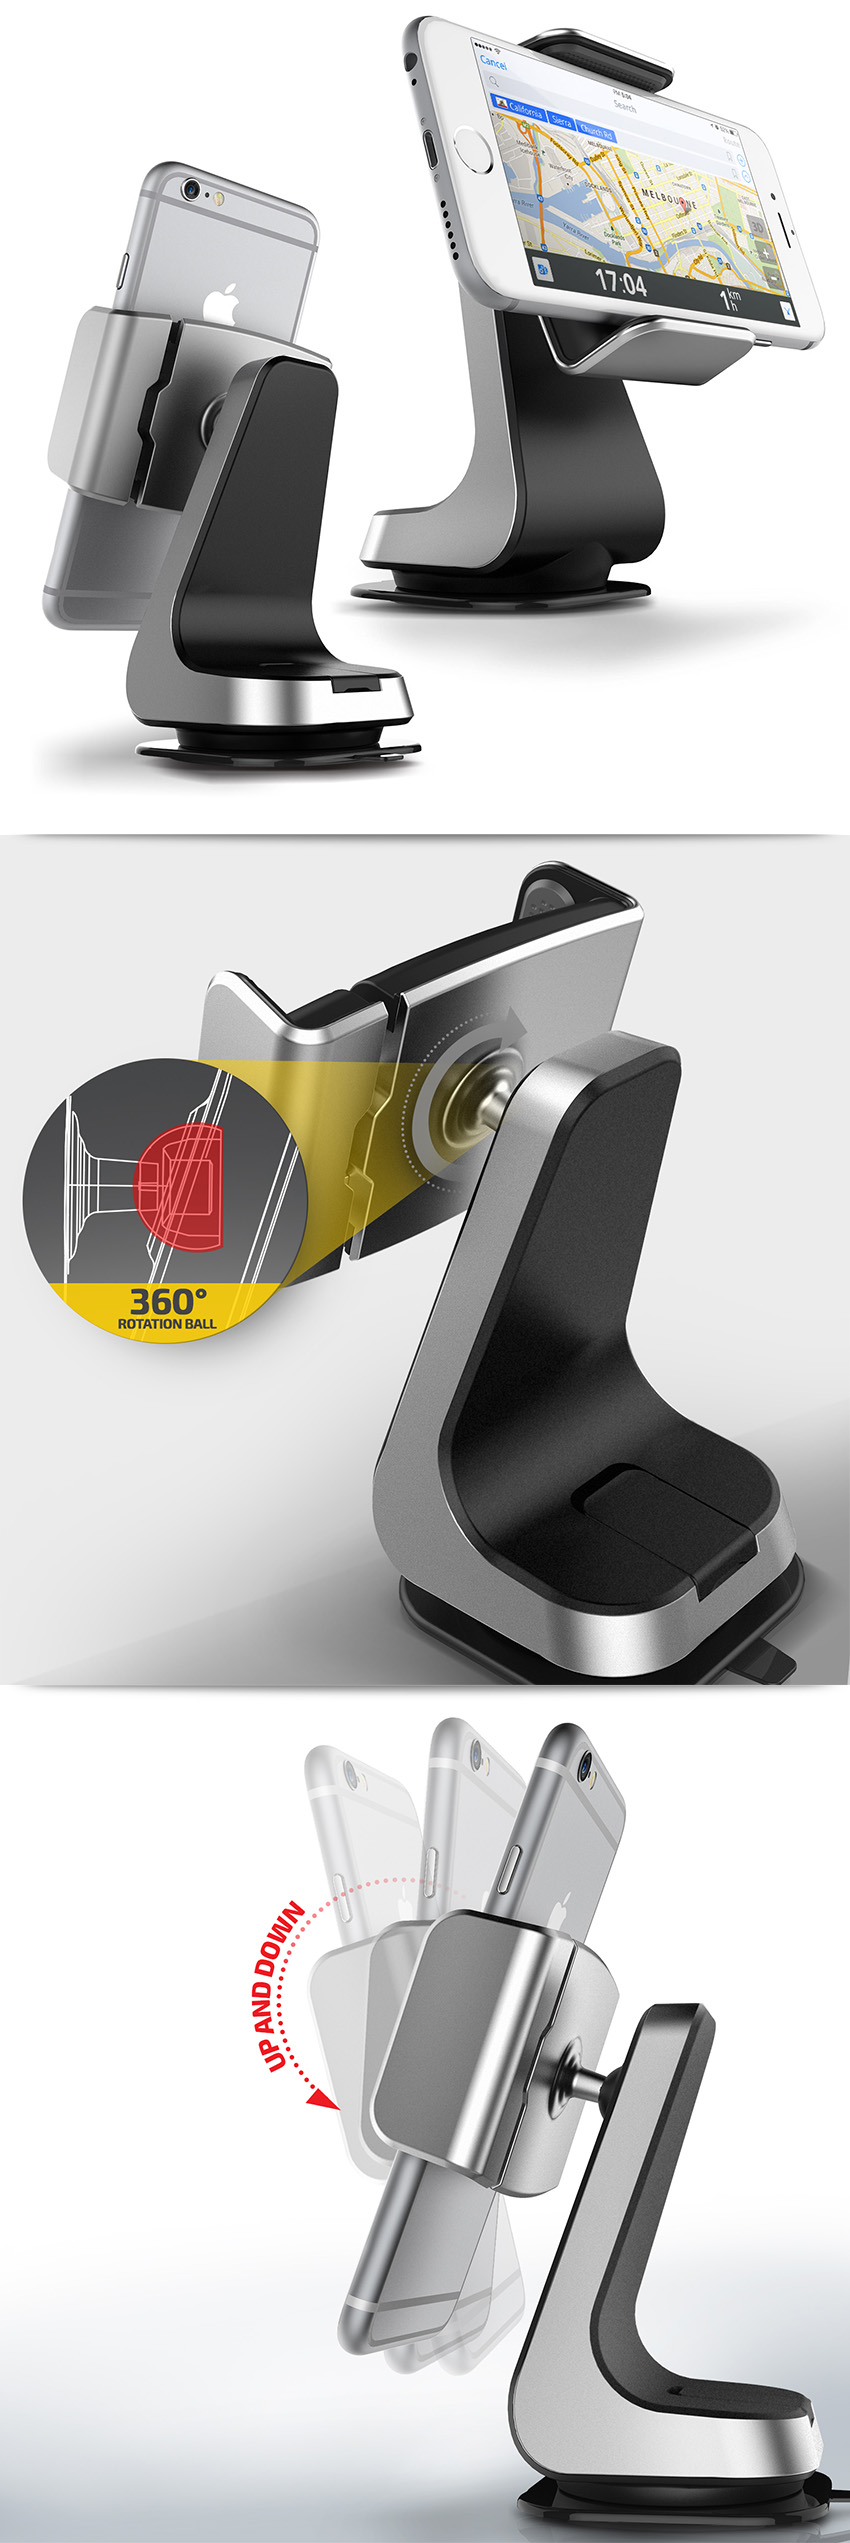 urcover universal kfz handy halterung smartphone auto. Black Bedroom Furniture Sets. Home Design Ideas